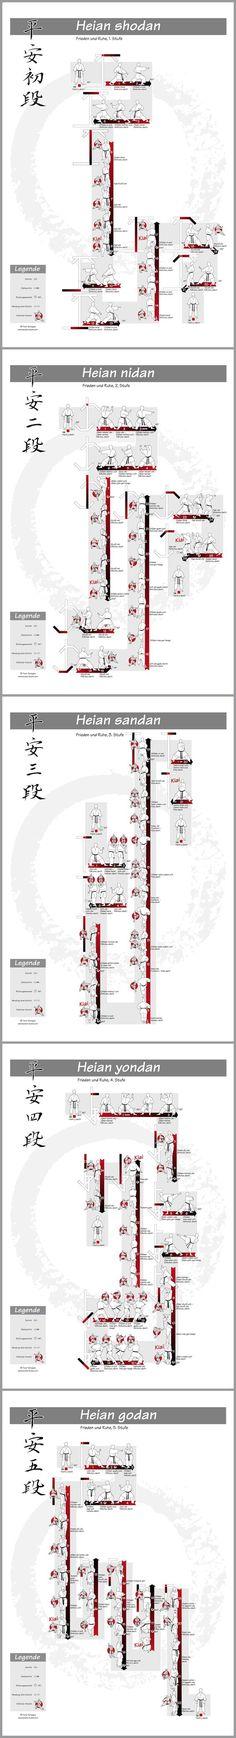 Basis-Kata Shotokan